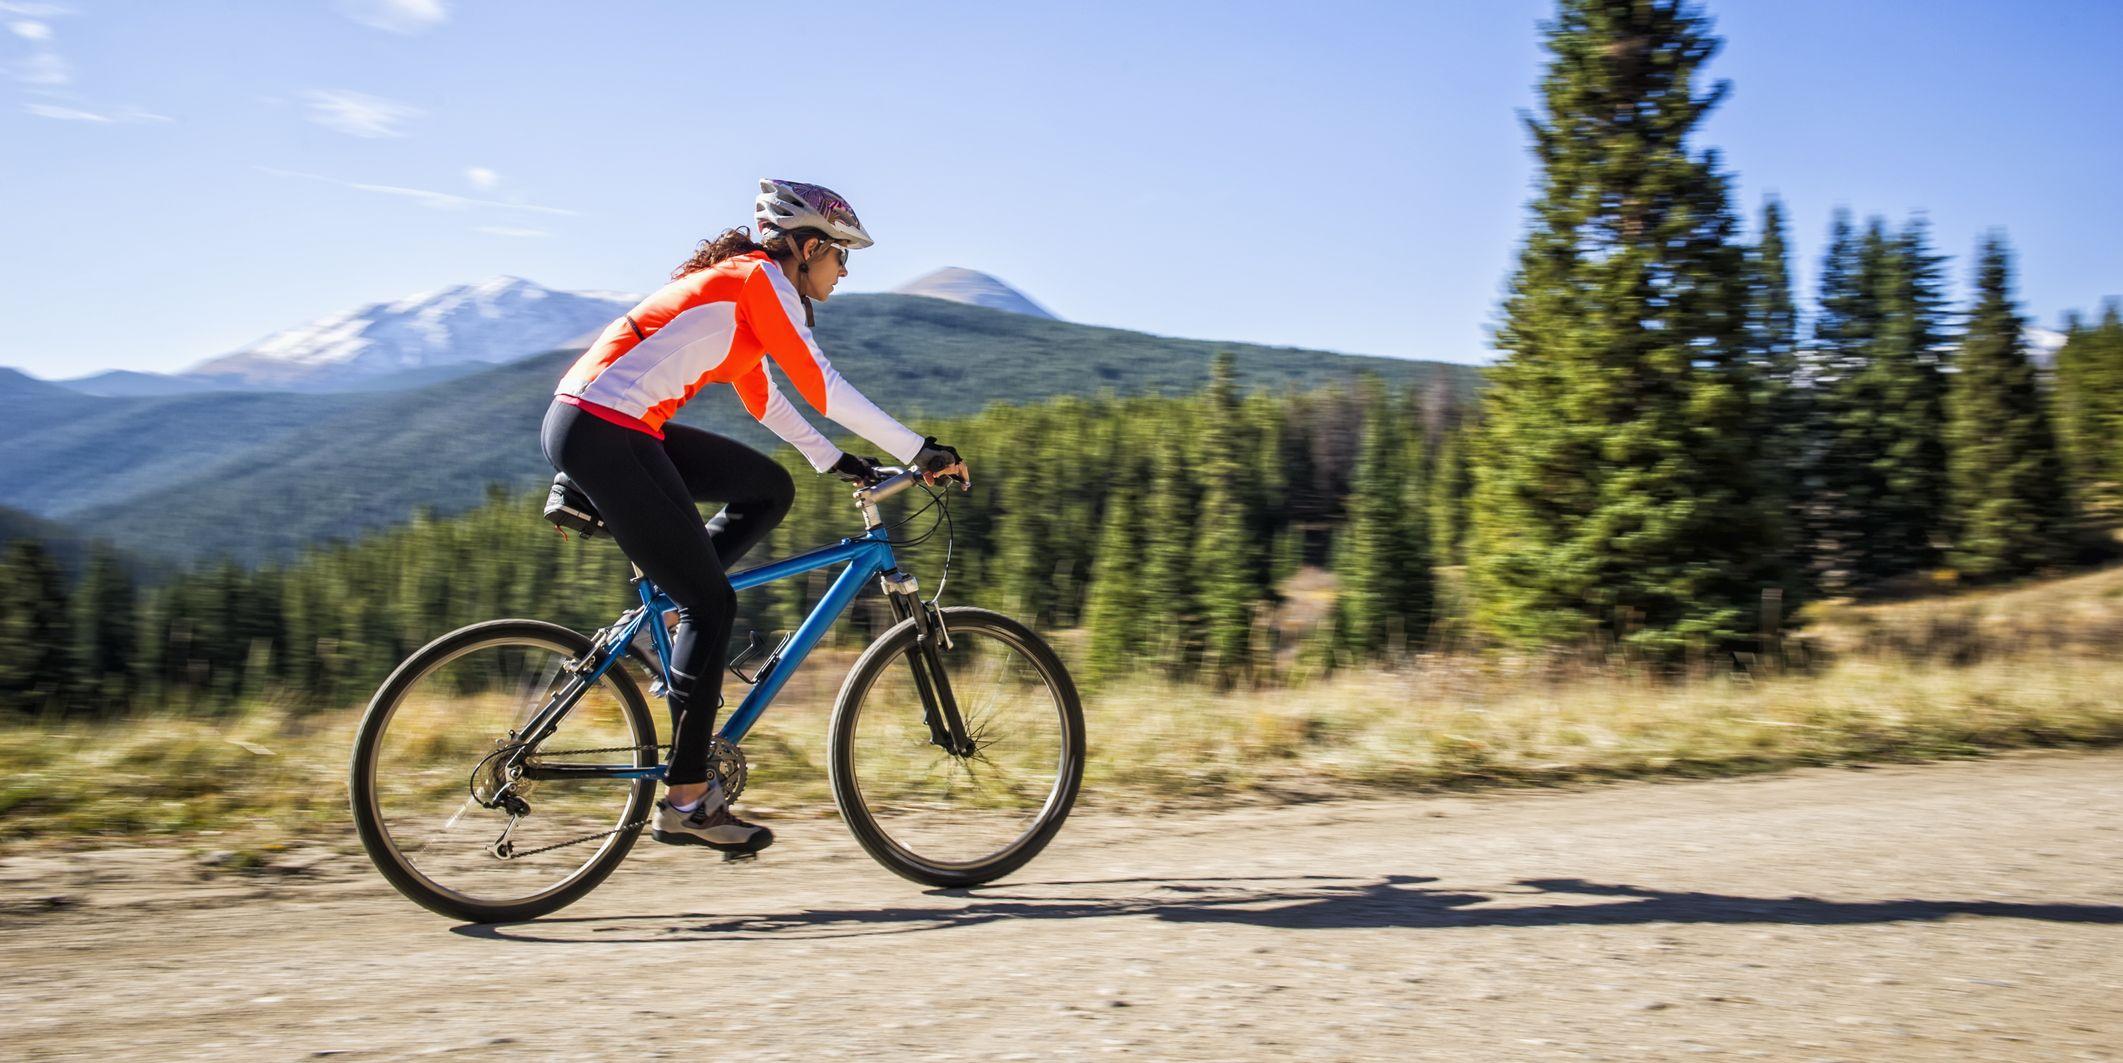 Hispanic woman riding dirt bike in rural landscape